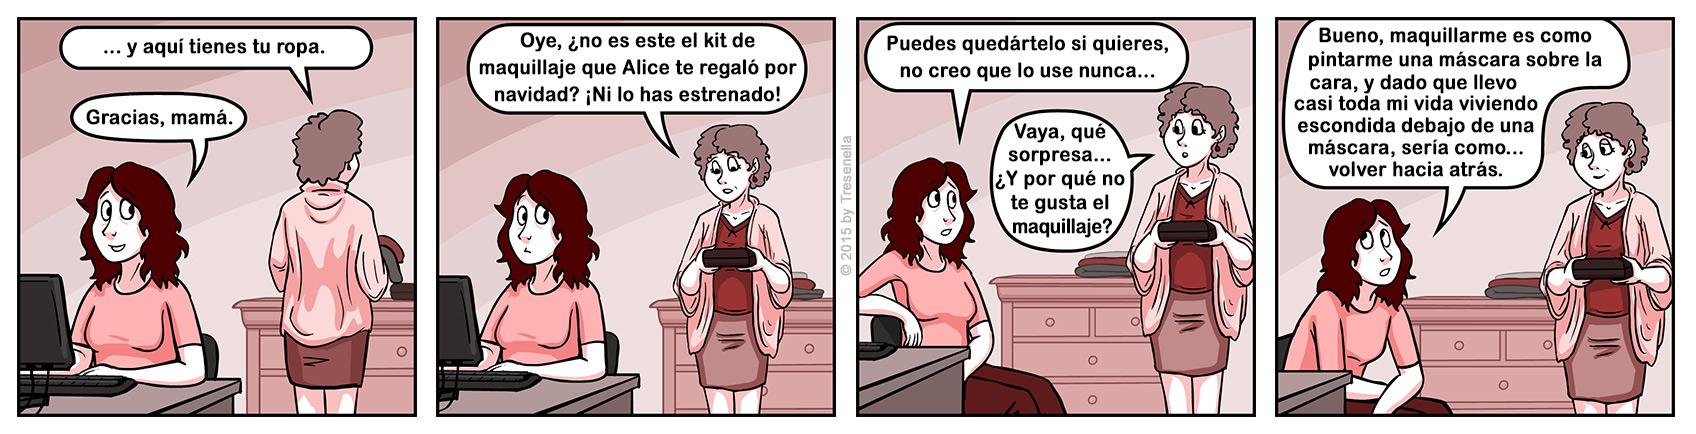 TransLucid - 24 [Spanish] by TransLucidComic